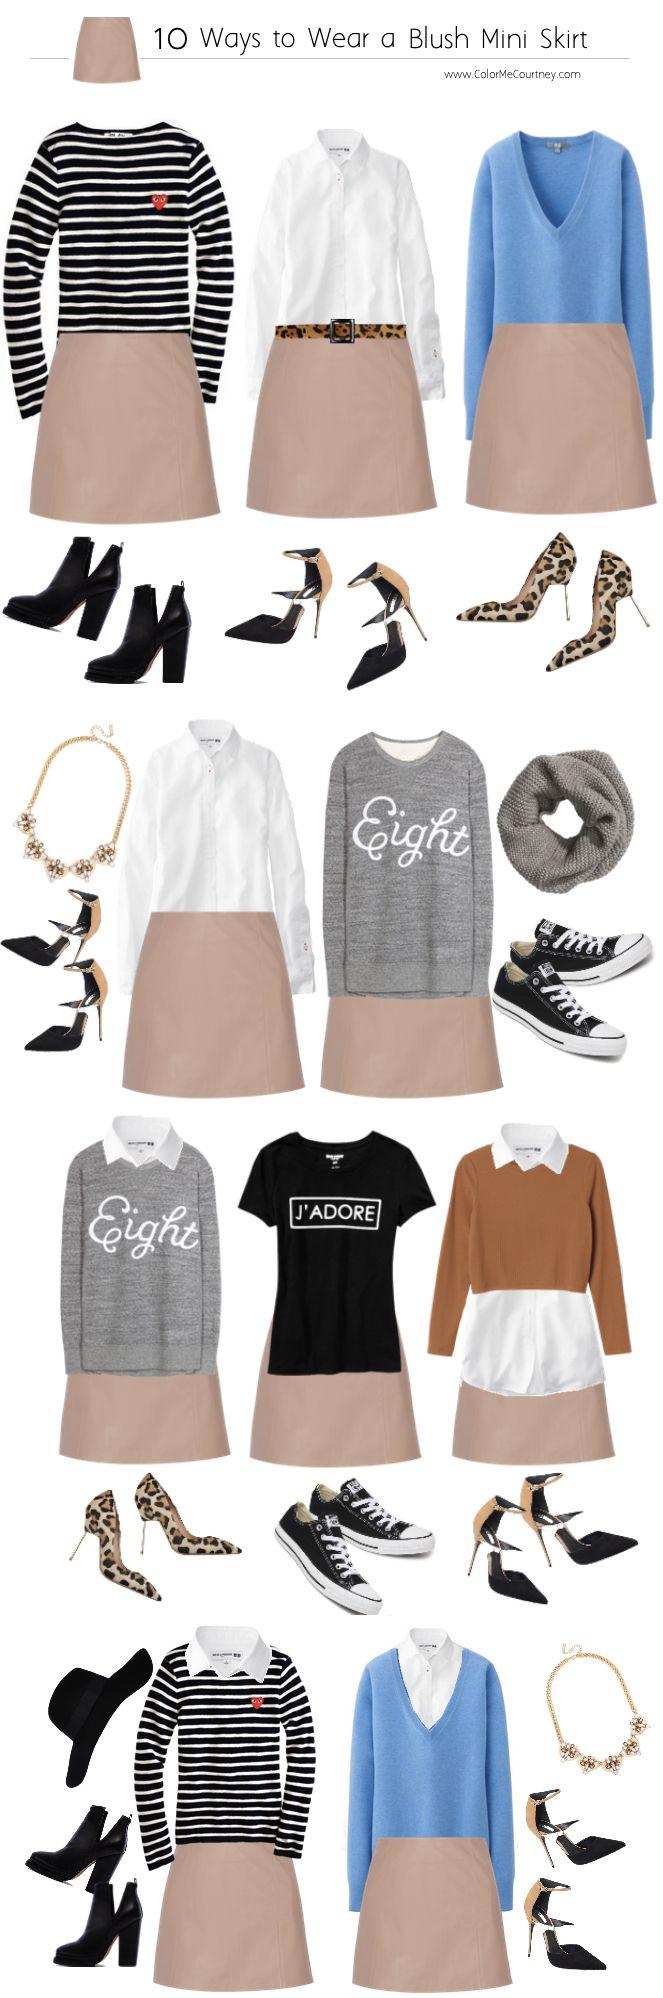 10 ways to wear a blush mini skirt